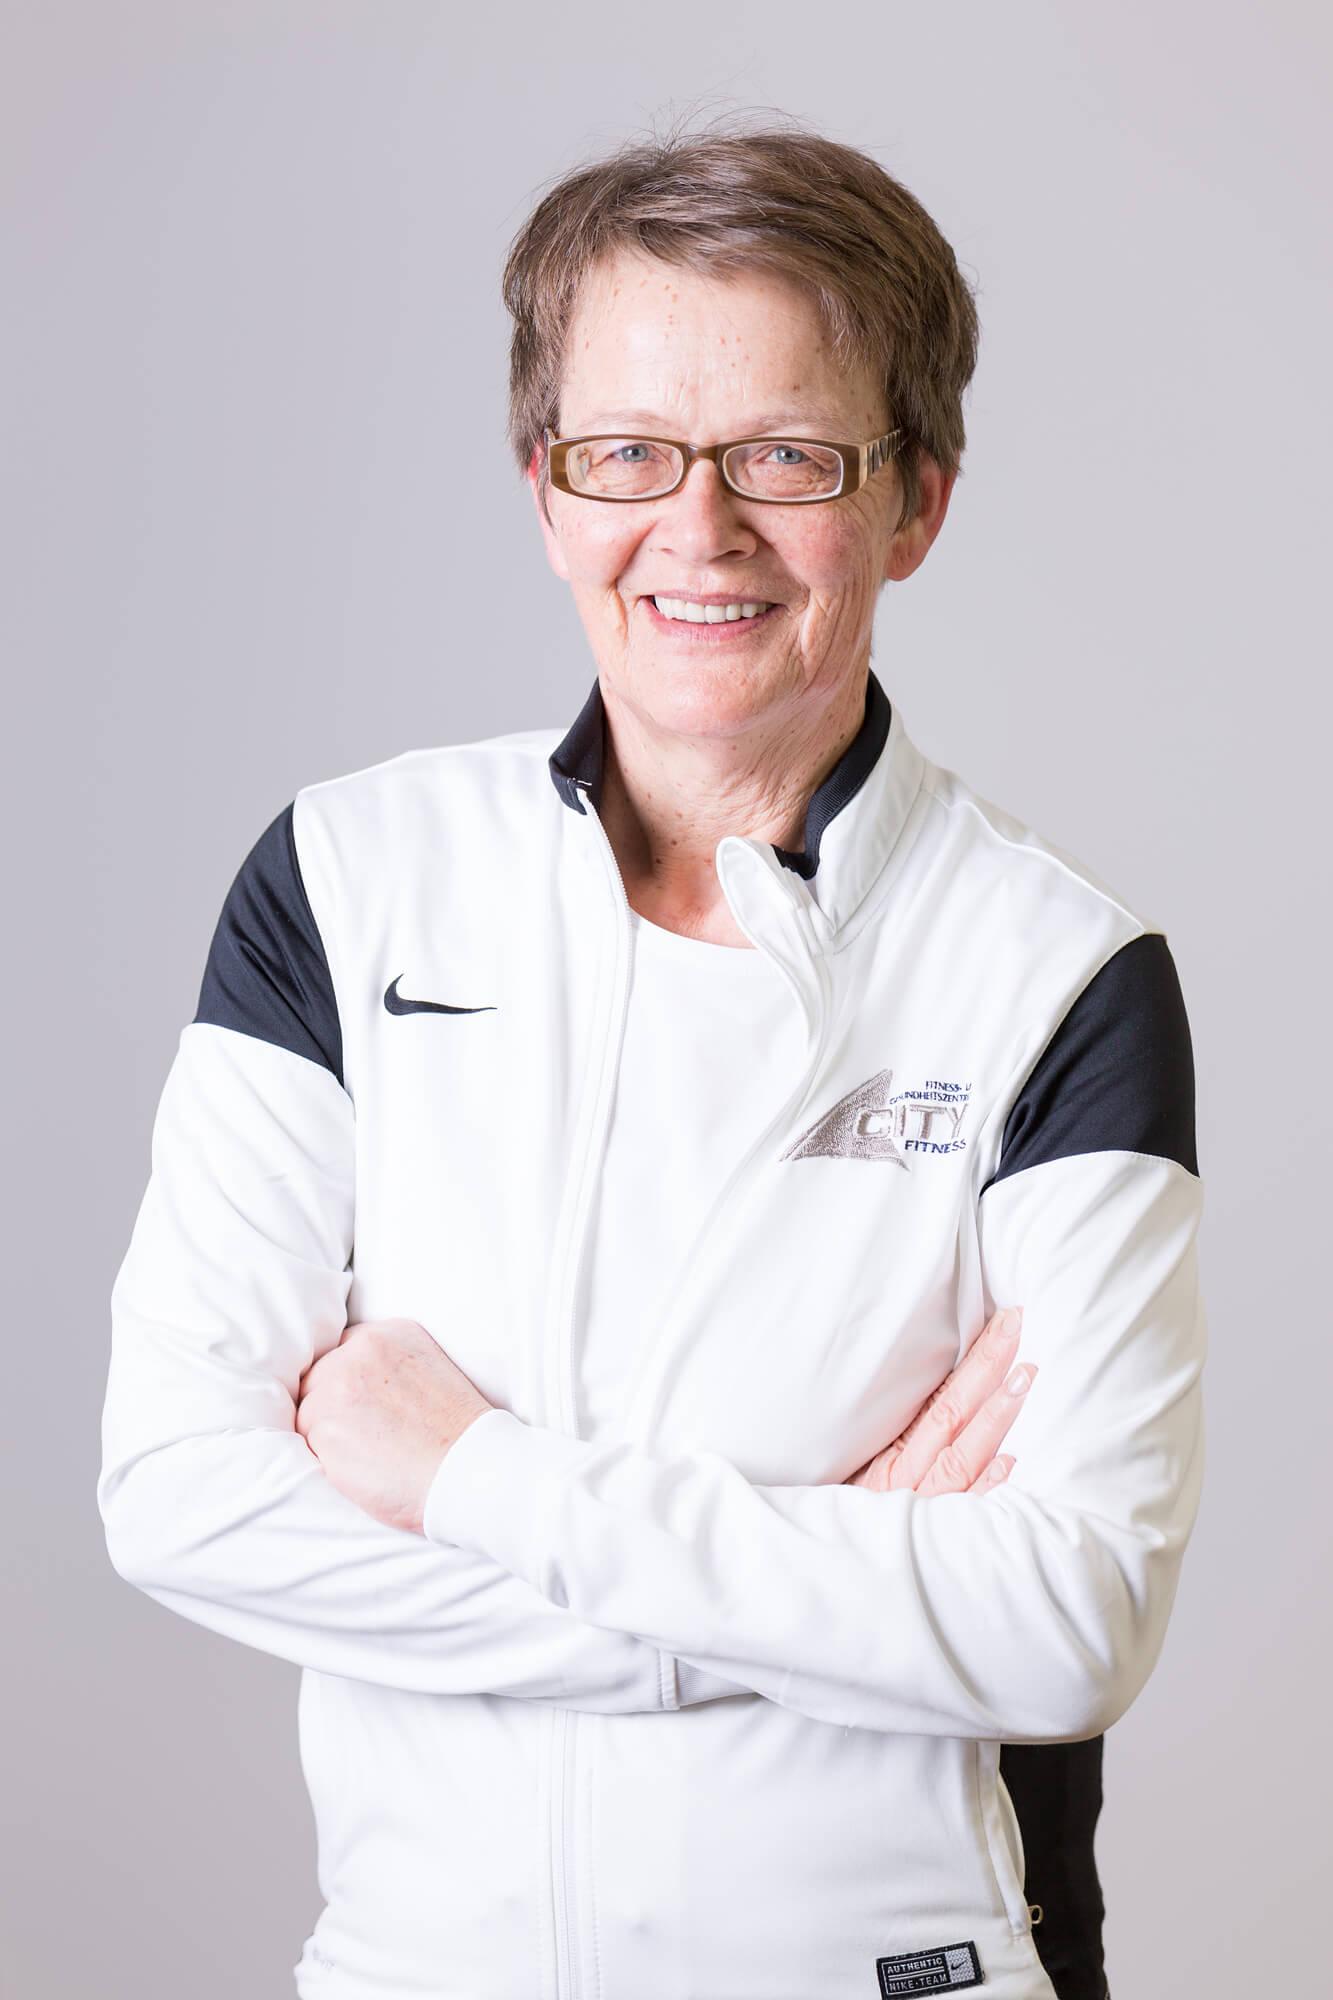 Barbara Muenninghoff